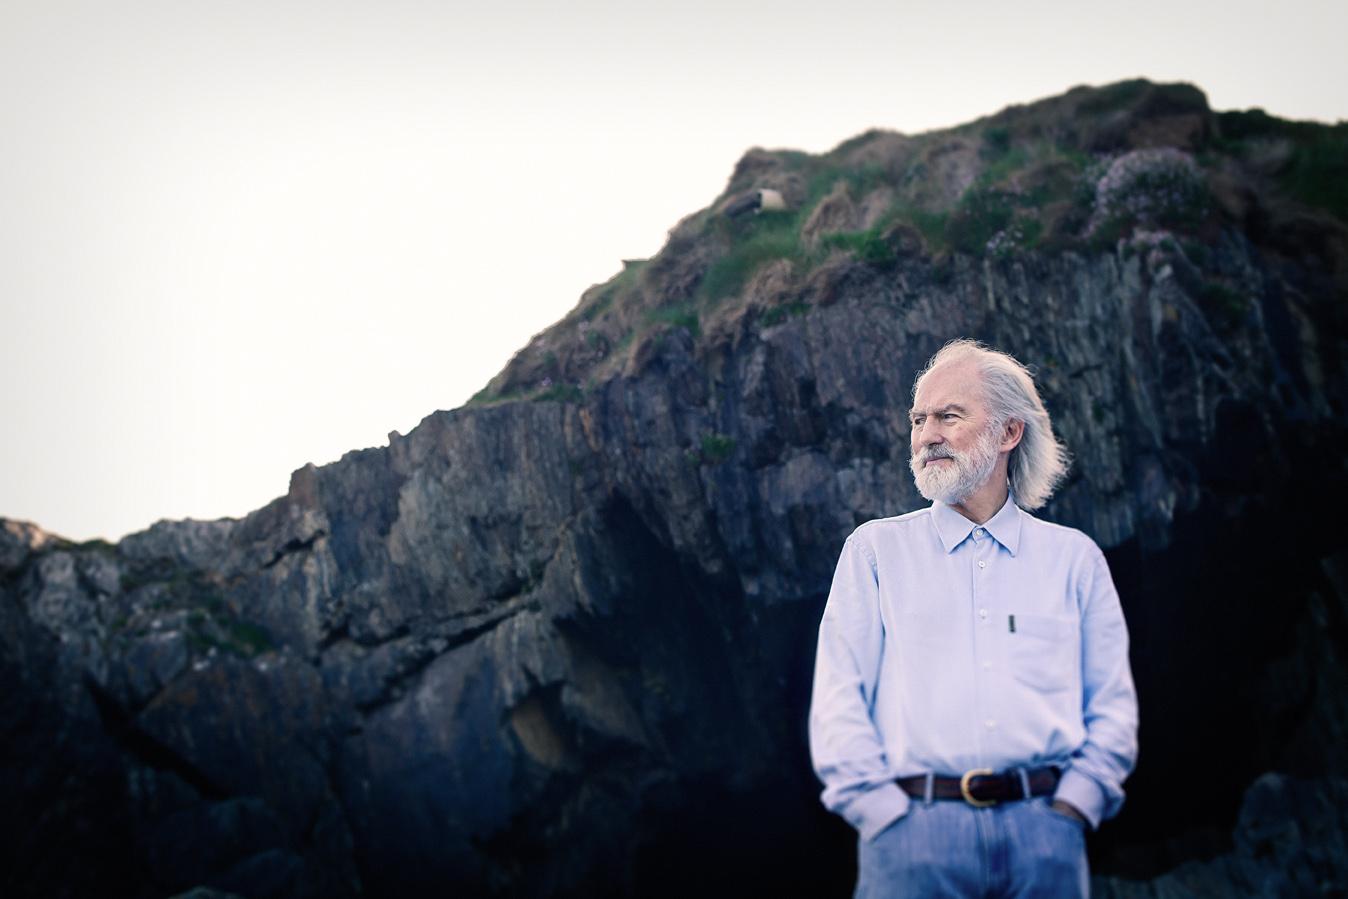 Man & Myth - Roy Harper   Songs, Reviews, Credits   AllMusic